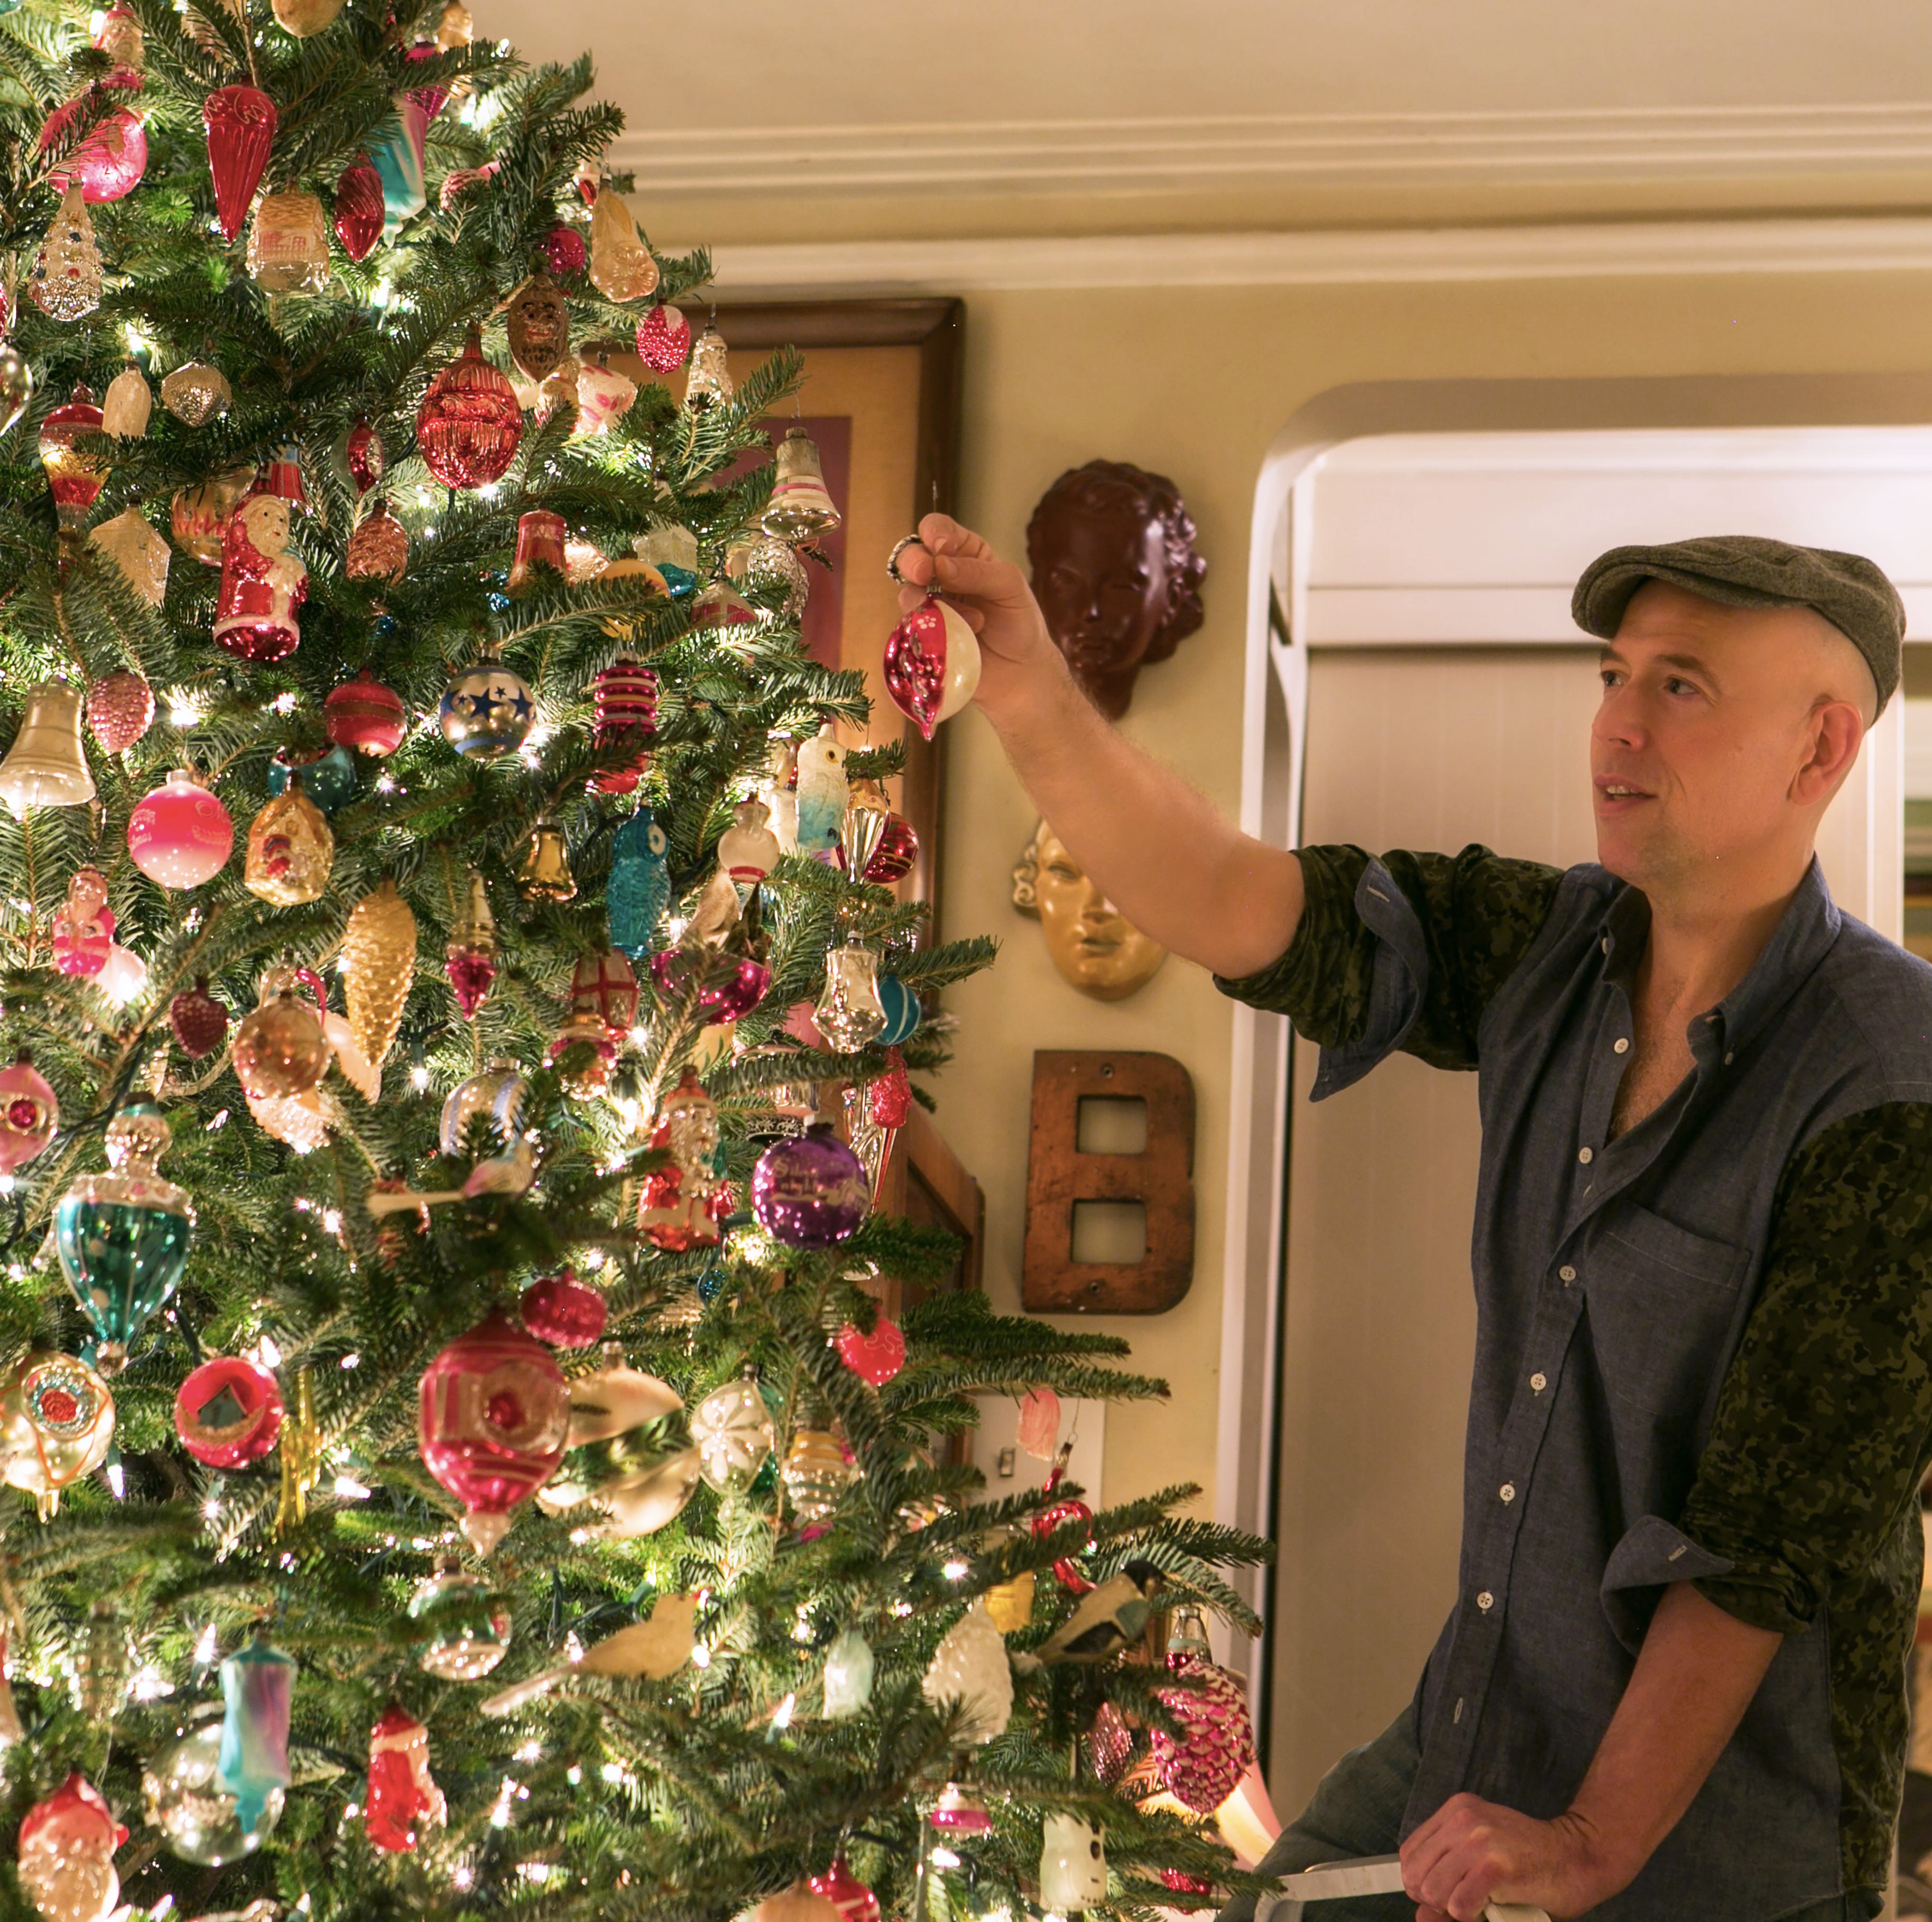 Christmas memories inspire 'Vintage Christmas'